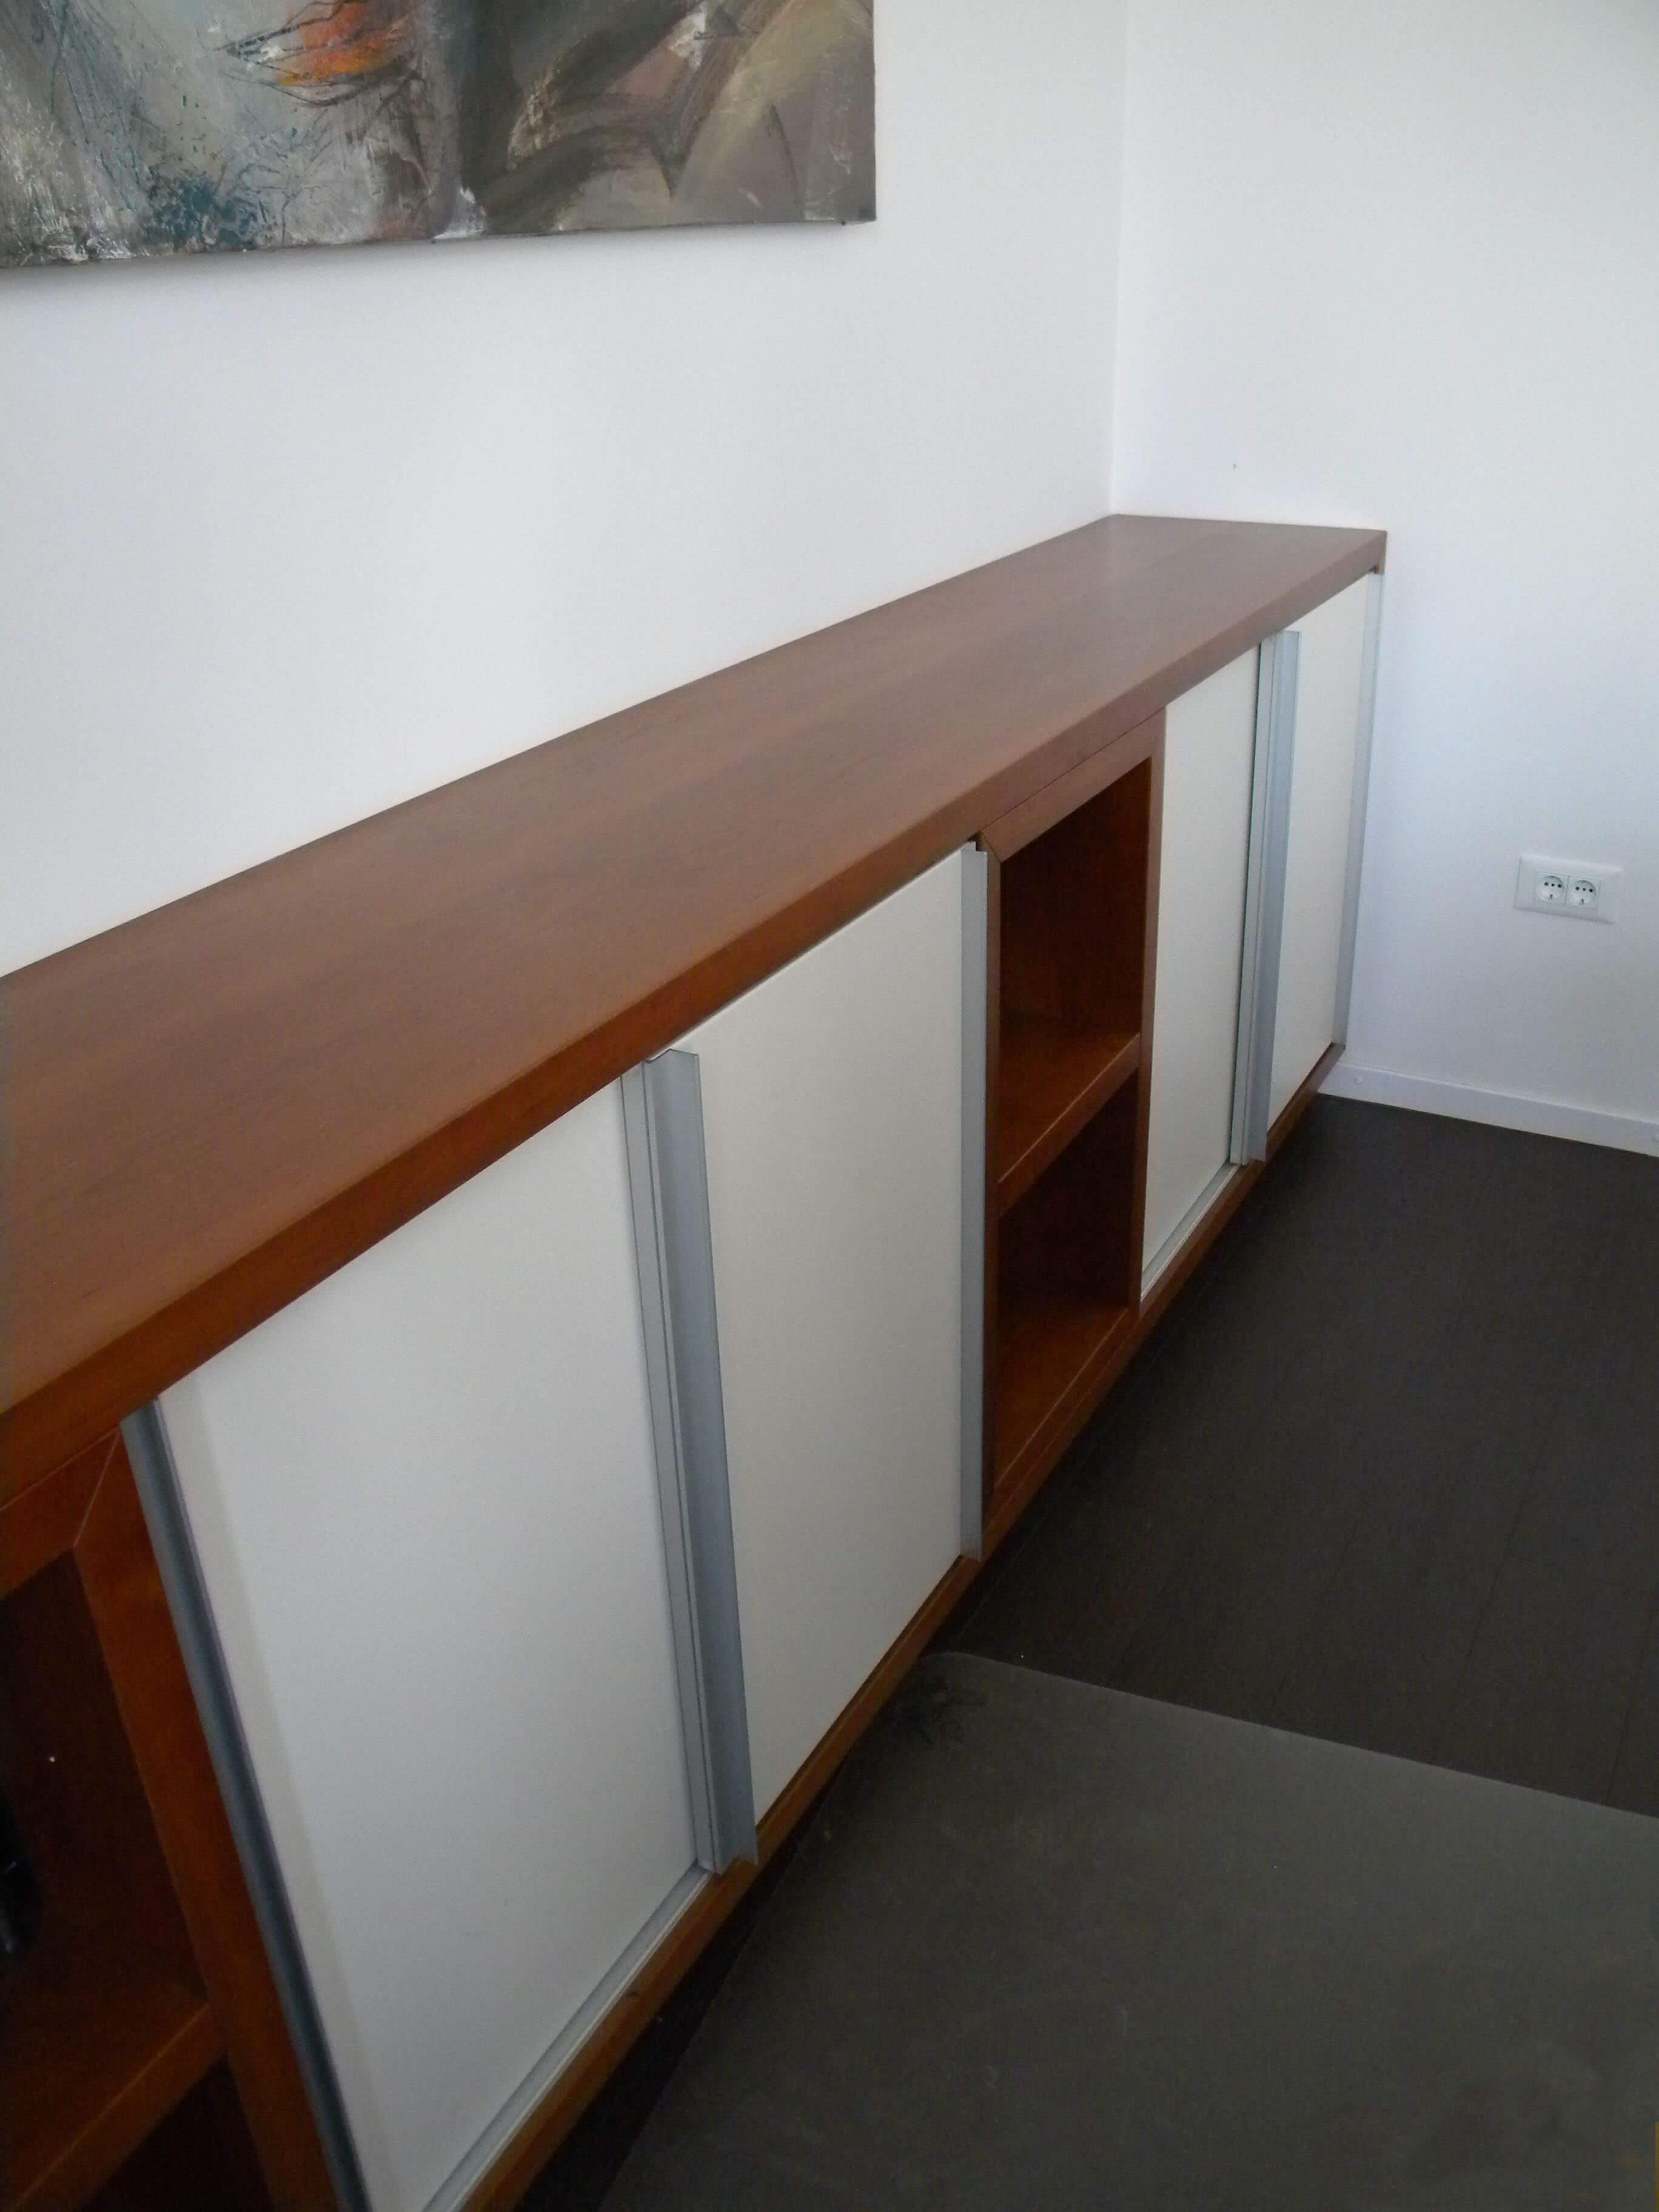 vgradna omara pohištvo za pisarno